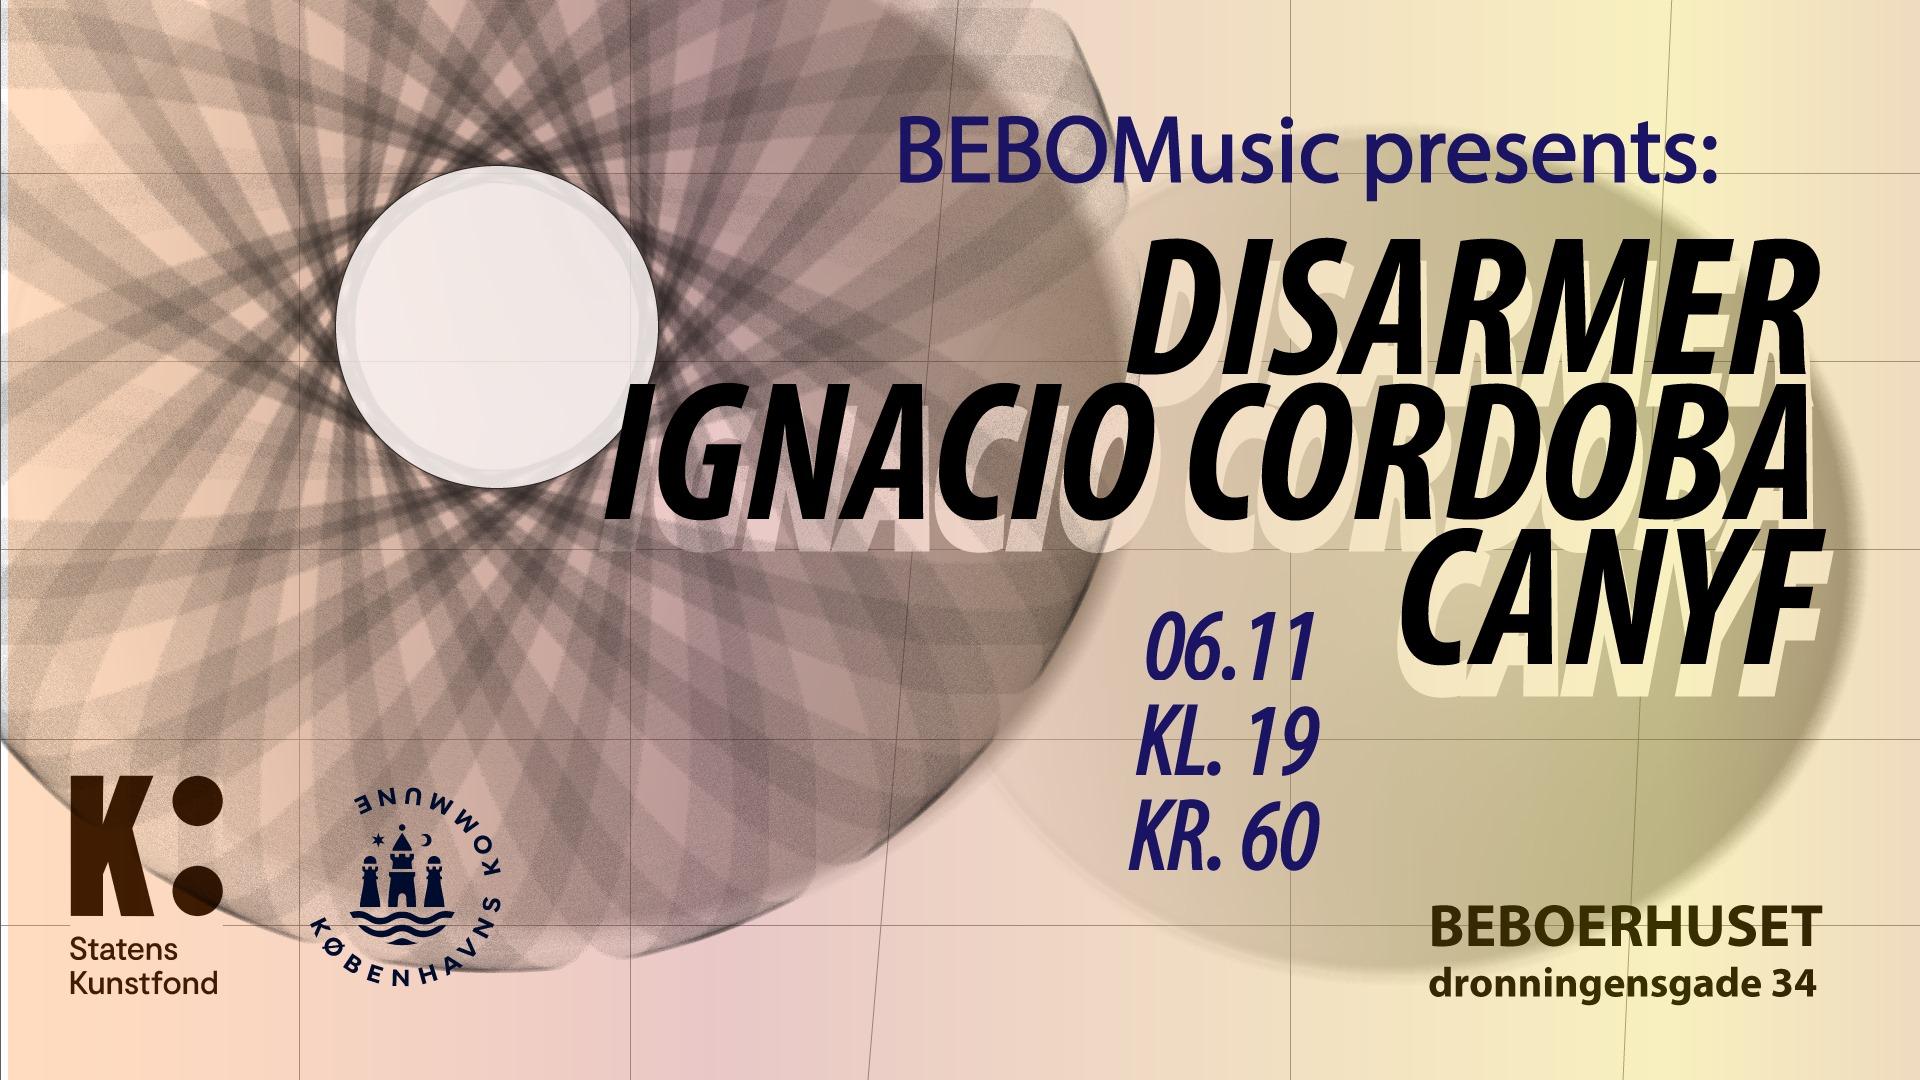 Disarmer / Ignacio Cordoba / Canyf